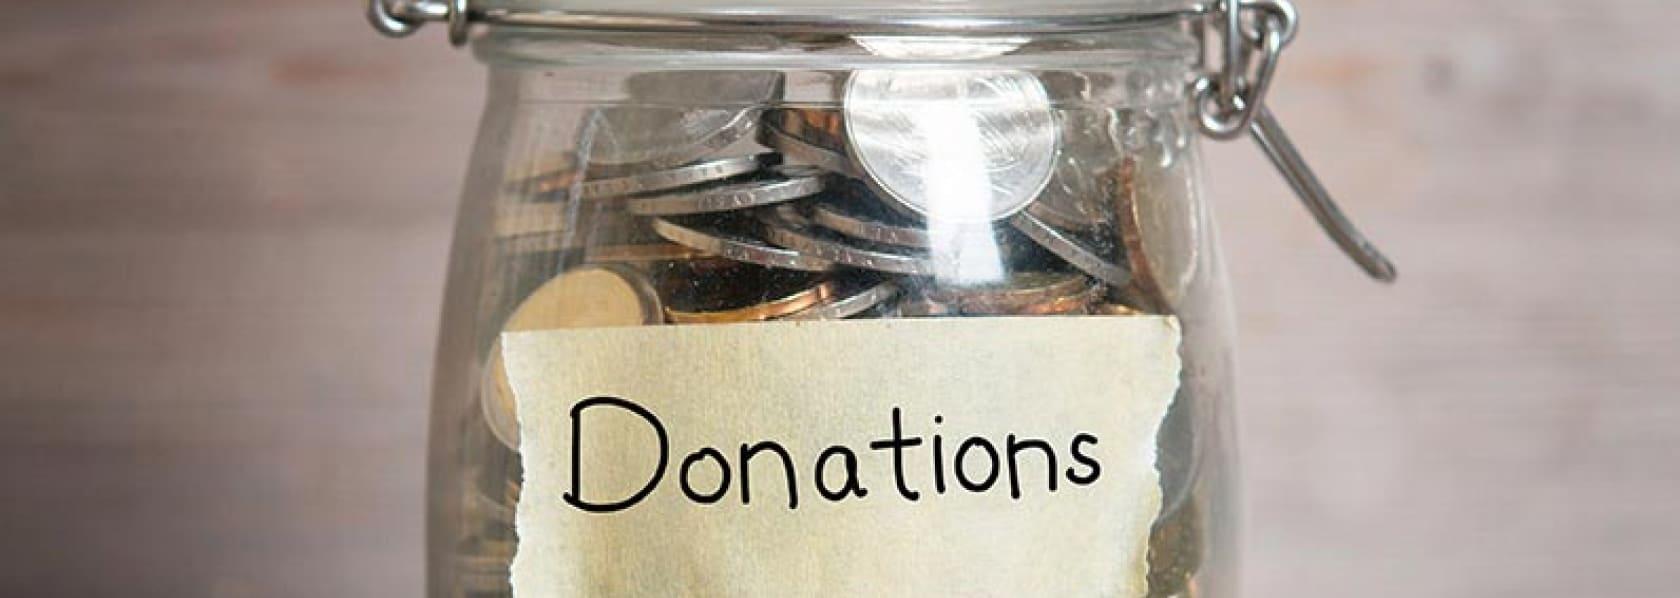 Donation & Crowdfunding Platforms image